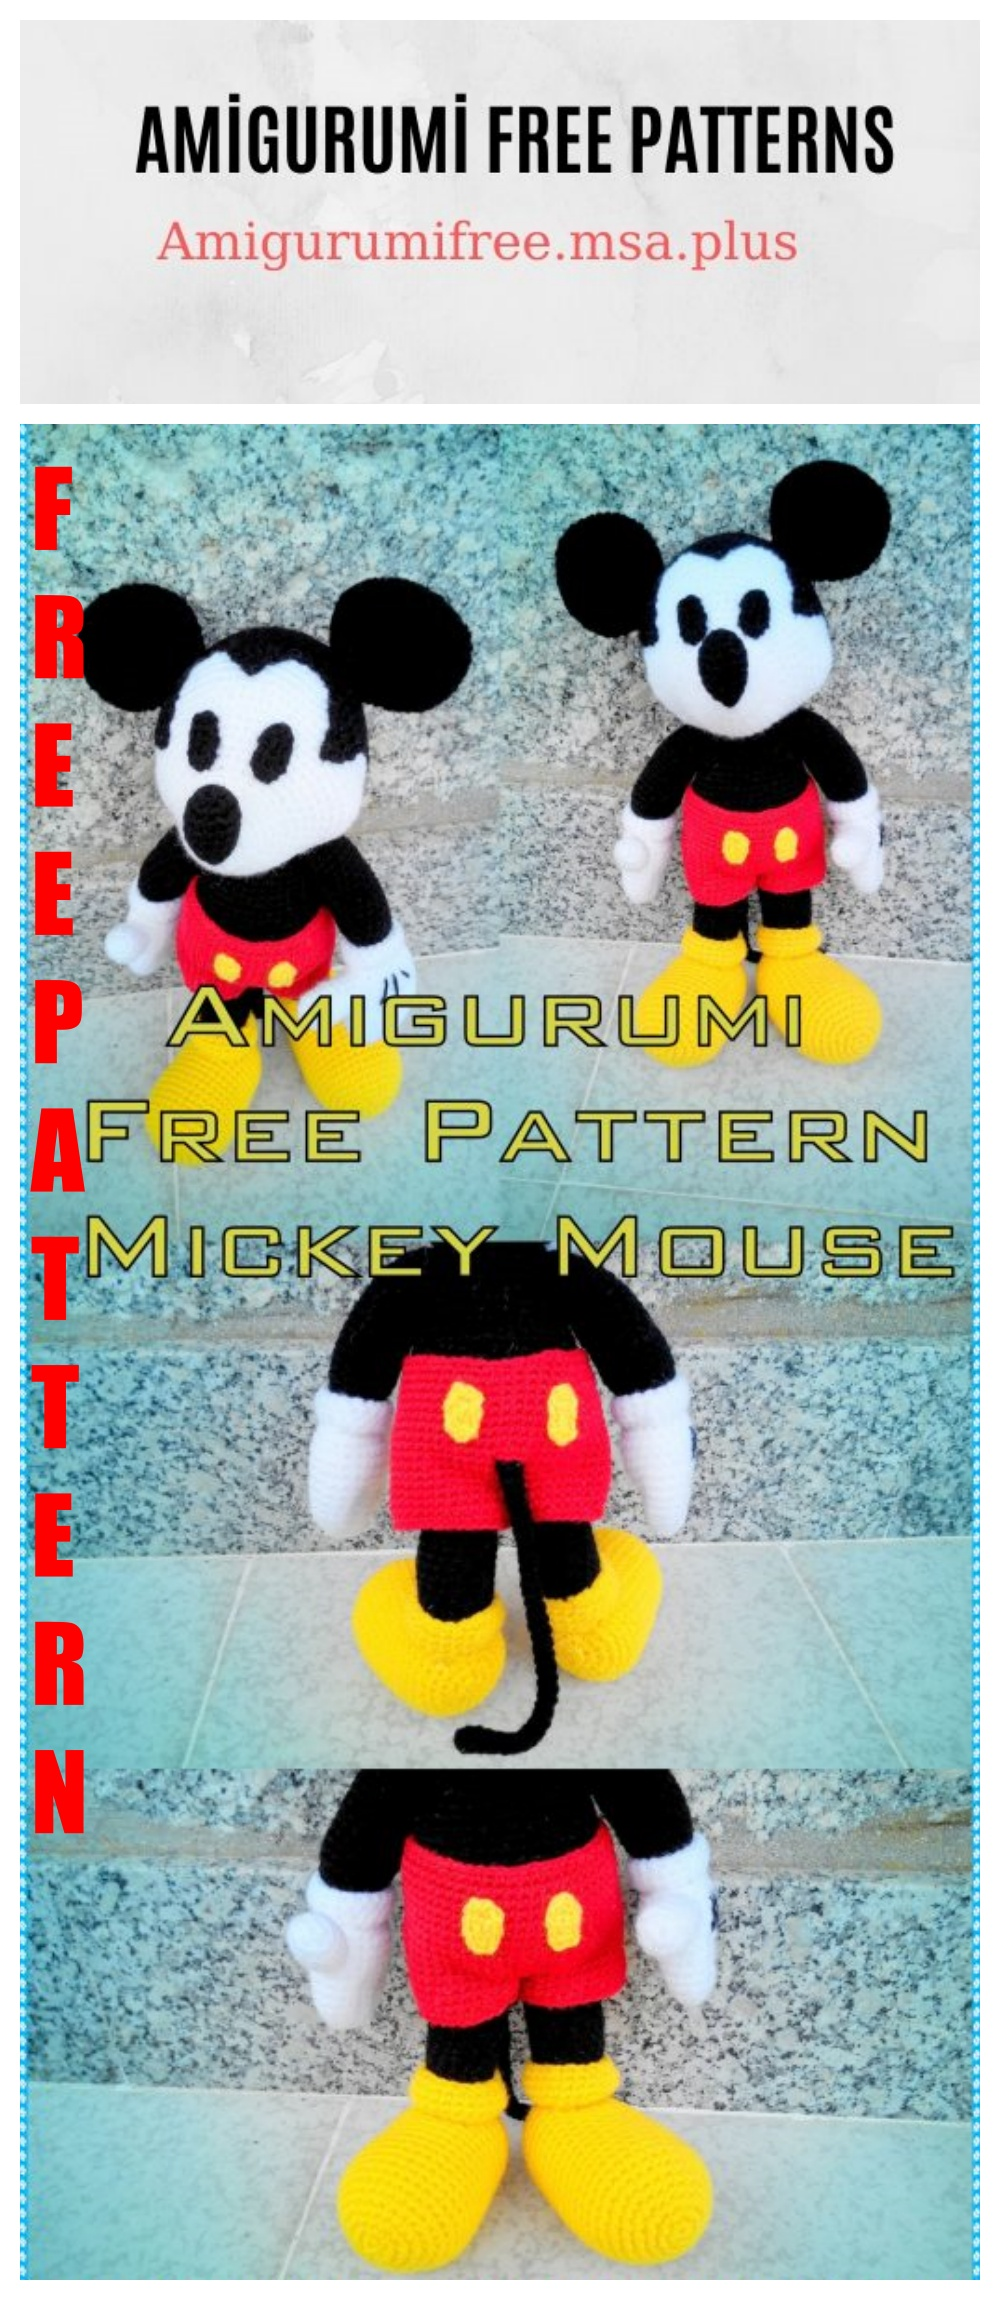 Pin by HiDBDesigns on Amigurumi | Crochet mickey mouse, Crochet ... | 2300x1000